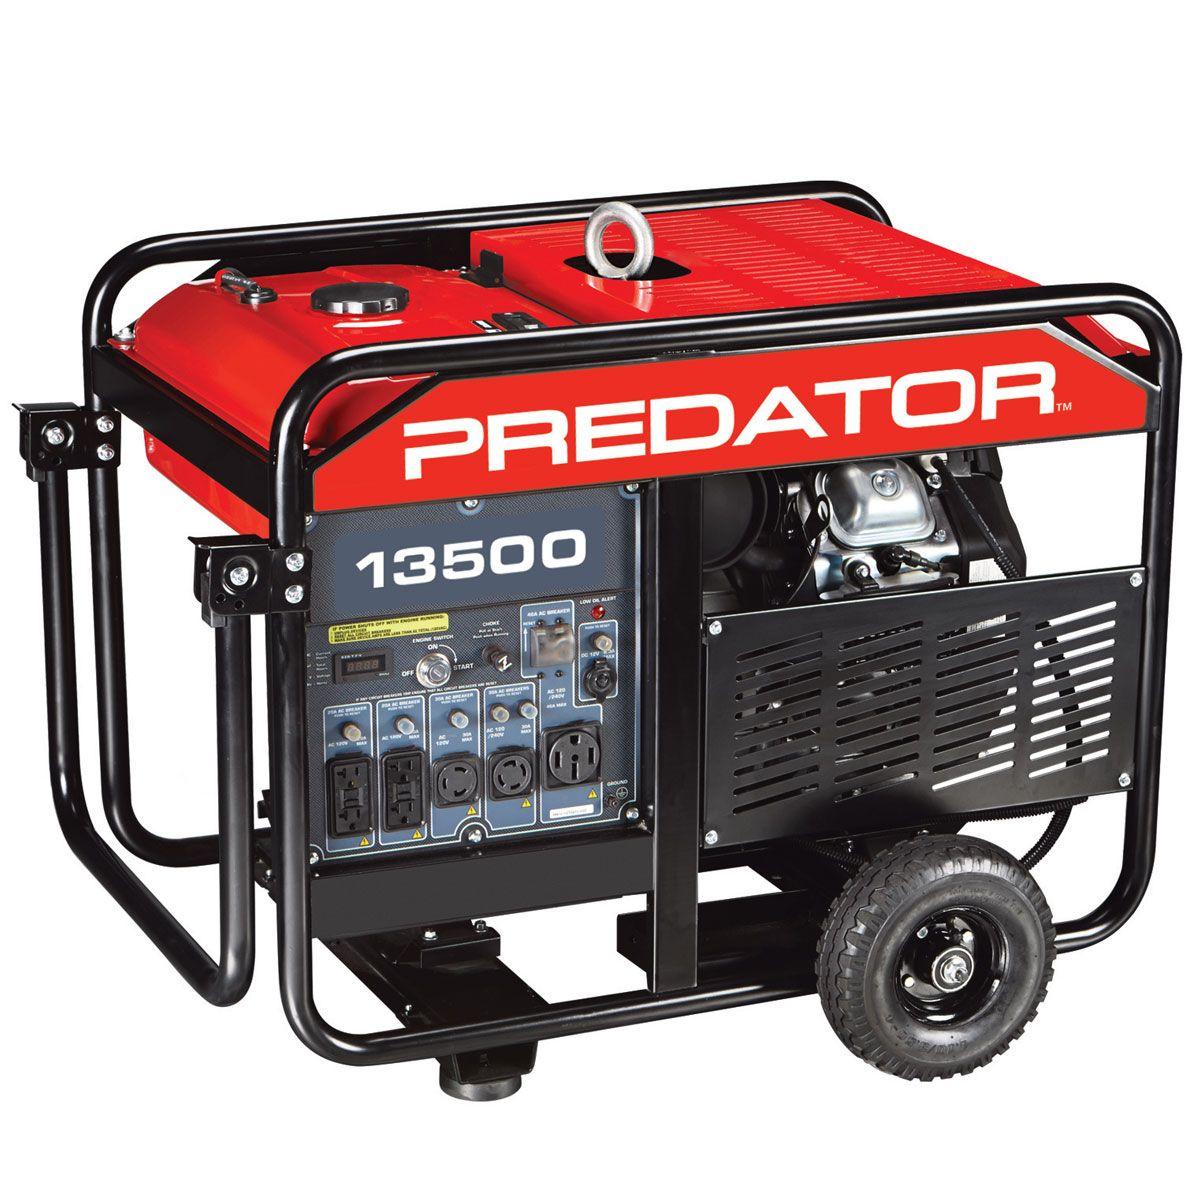 Amazing deals on this 13500/11000 Watt 670Cc 22Hp Predator